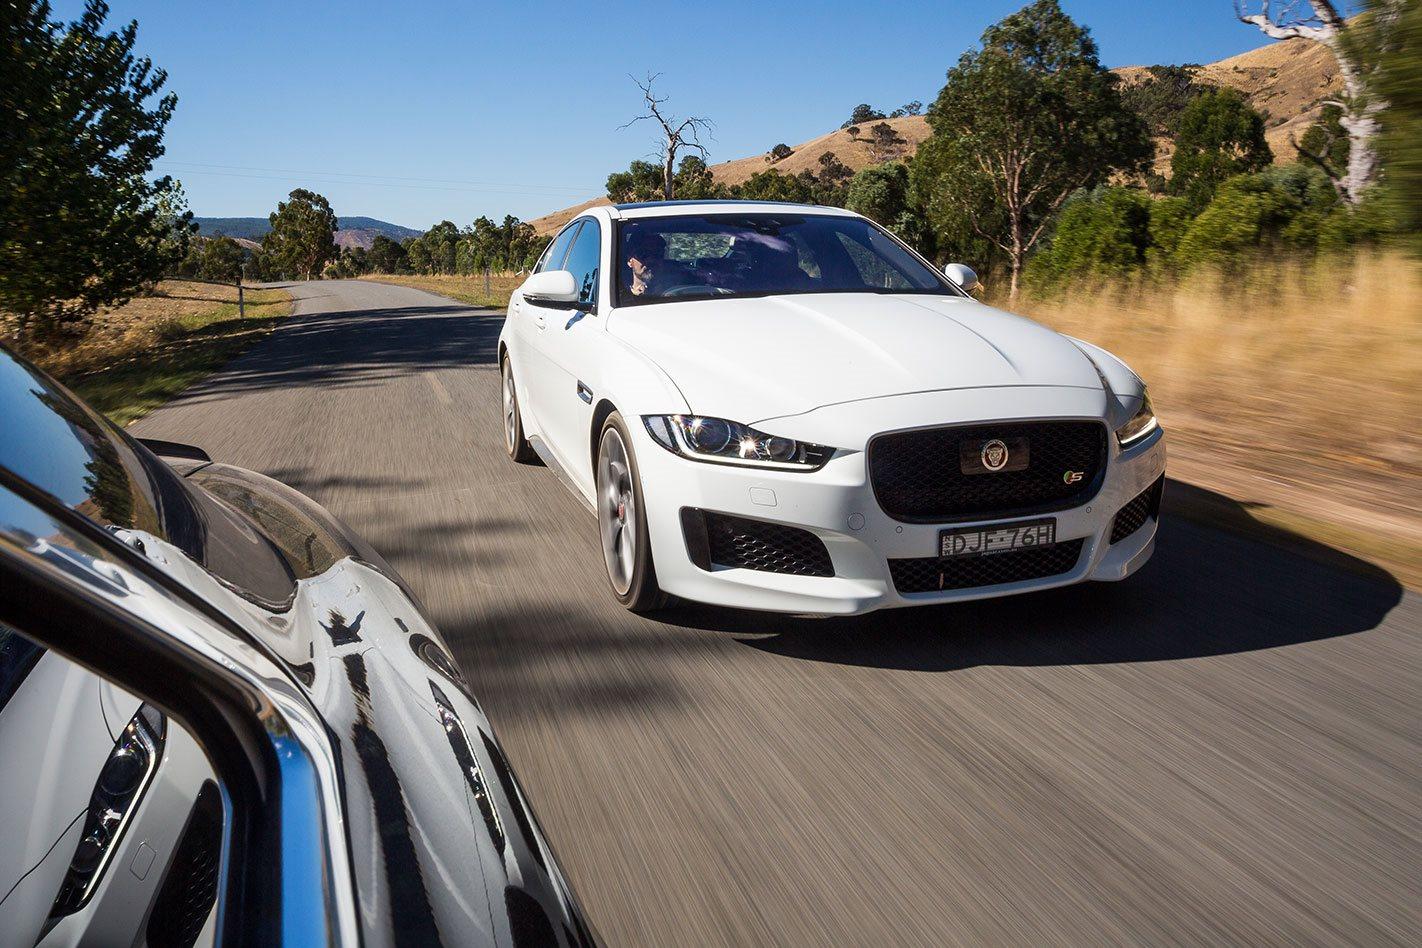 Jaguar-XE-S driving